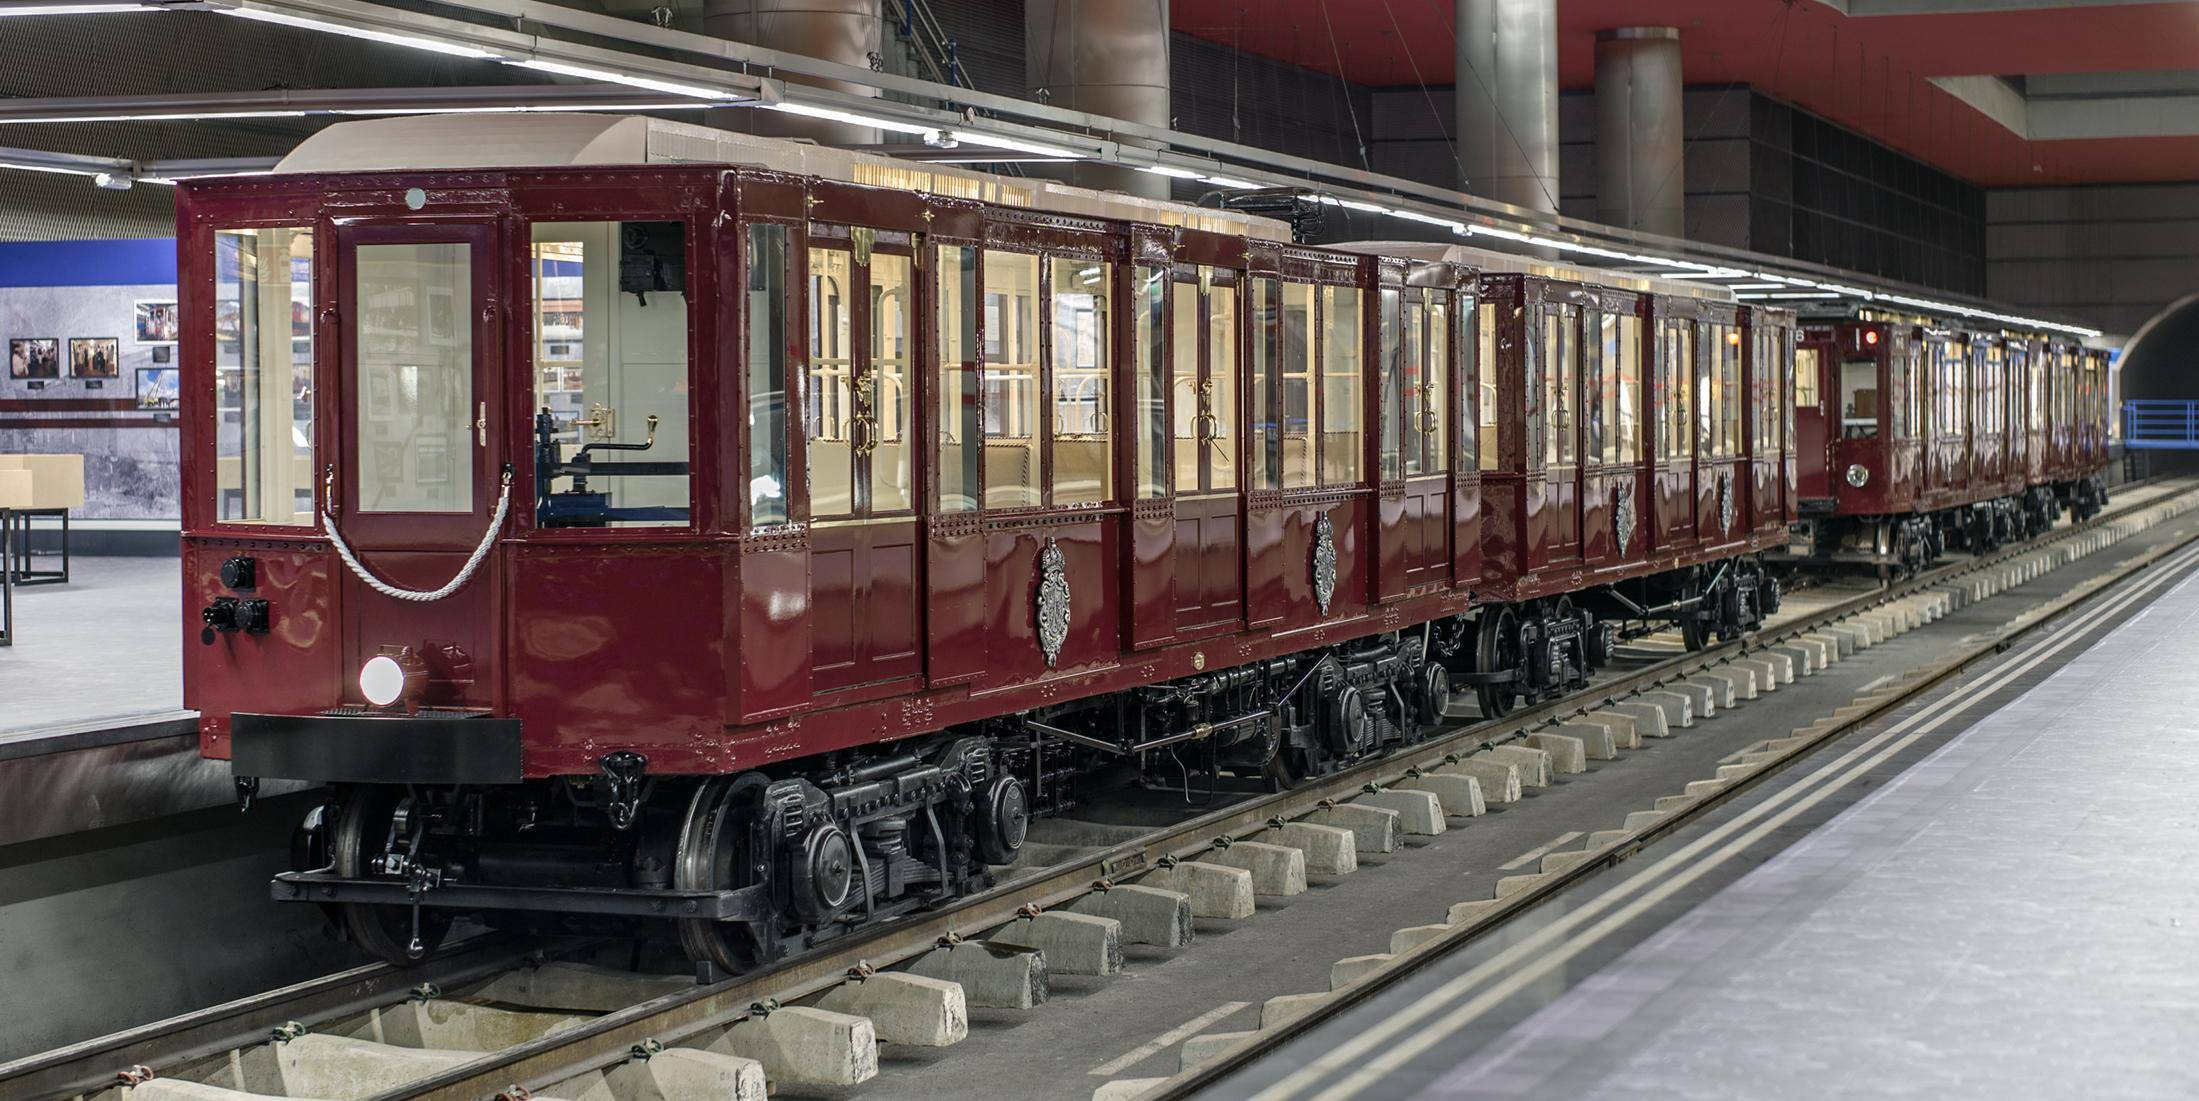 L2F Jul 19 pic Spain Madrid metro Chamartin museum